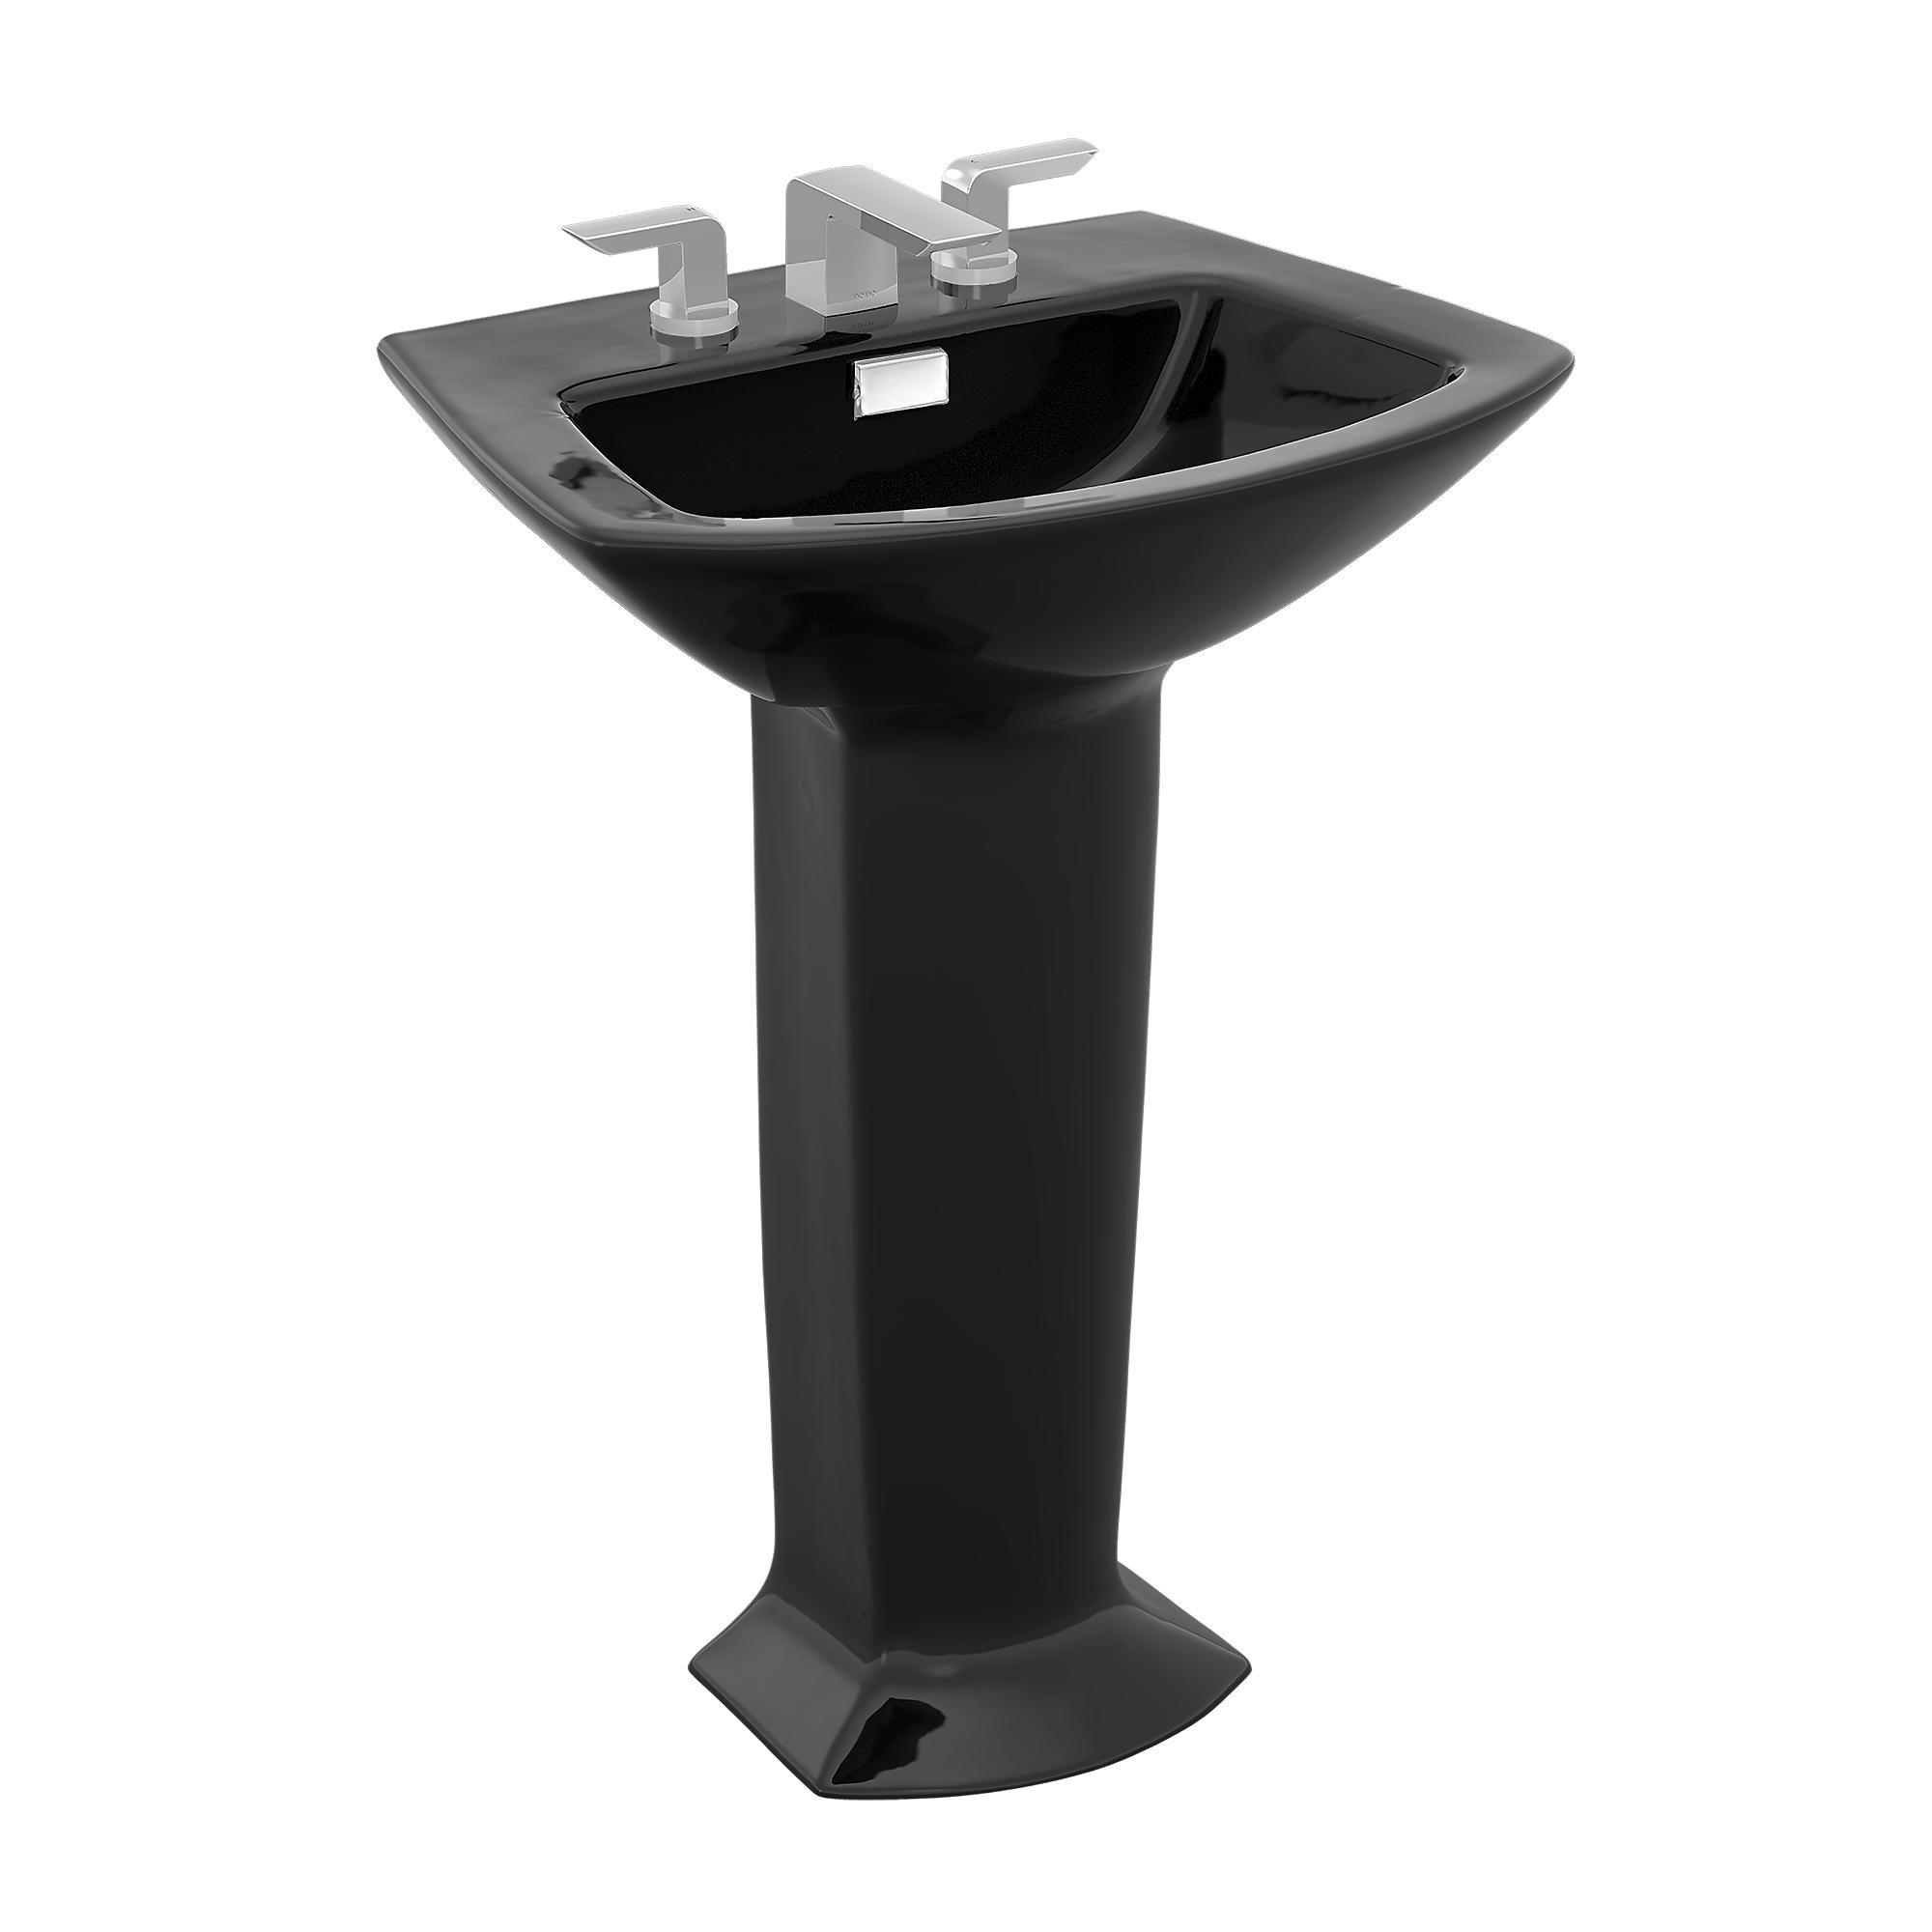 Lpt960 51 soir e  pedestal lavatory 0